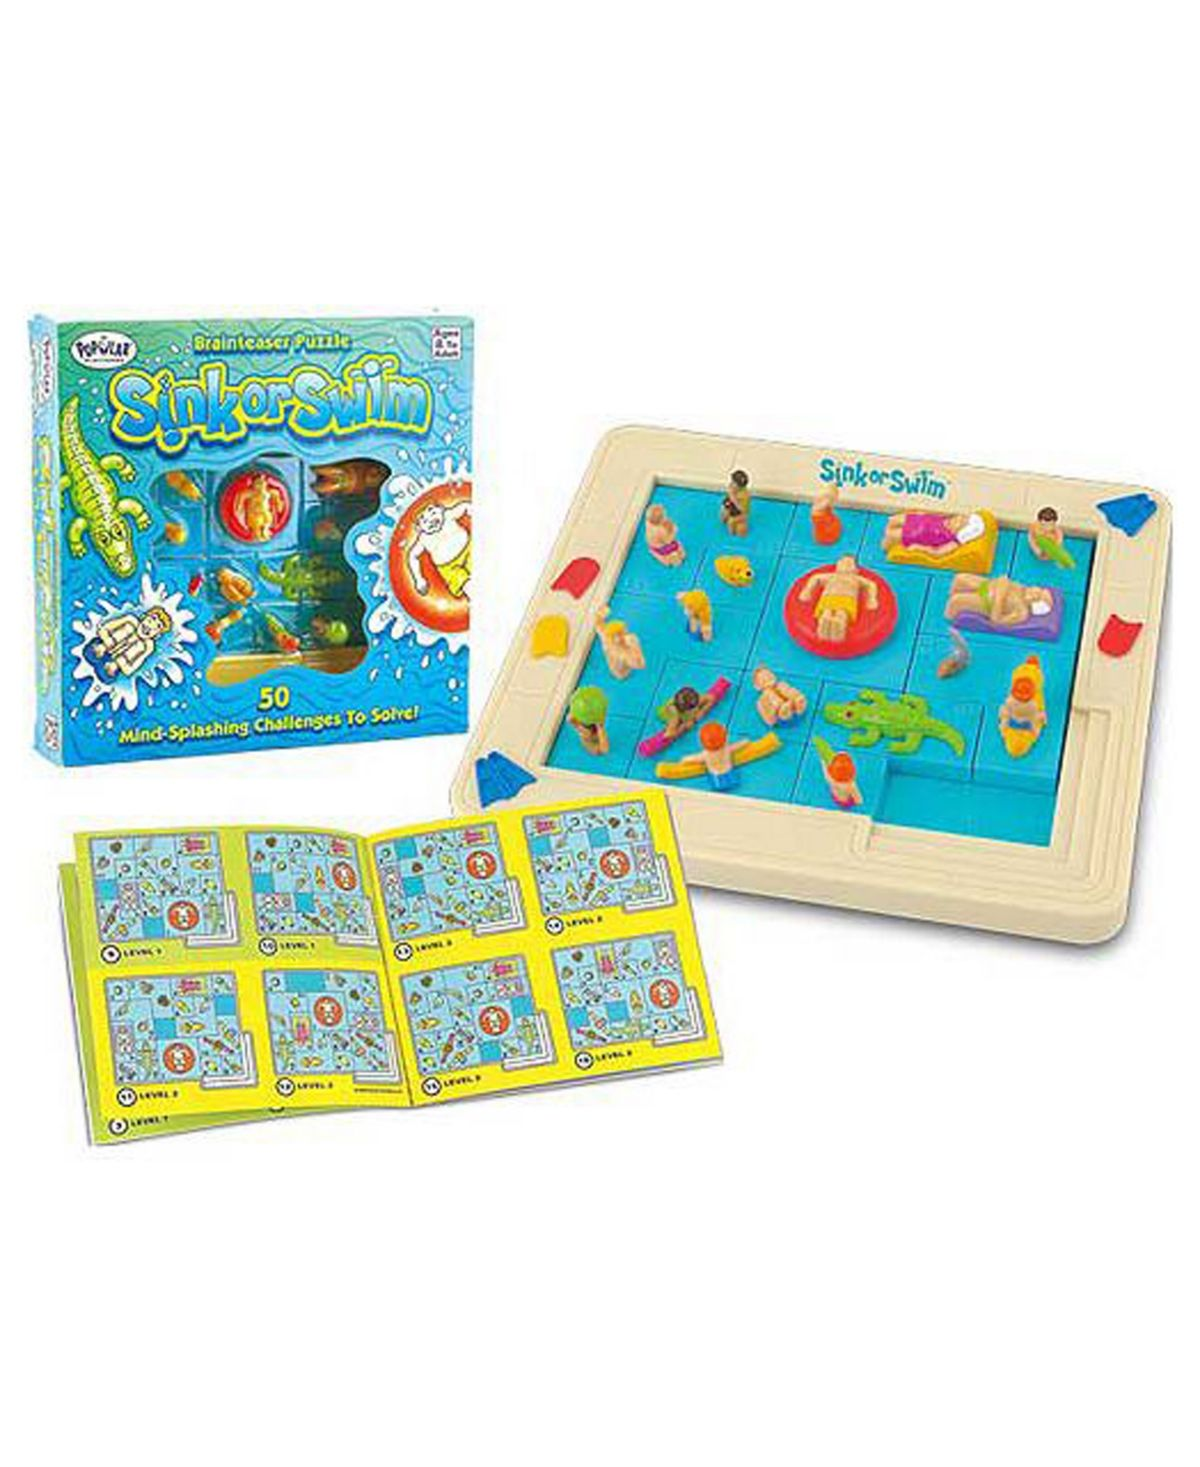 Sink Or Swim Brainteaser Puzzle Sink Or Swim Brain Teasers Learning Toys